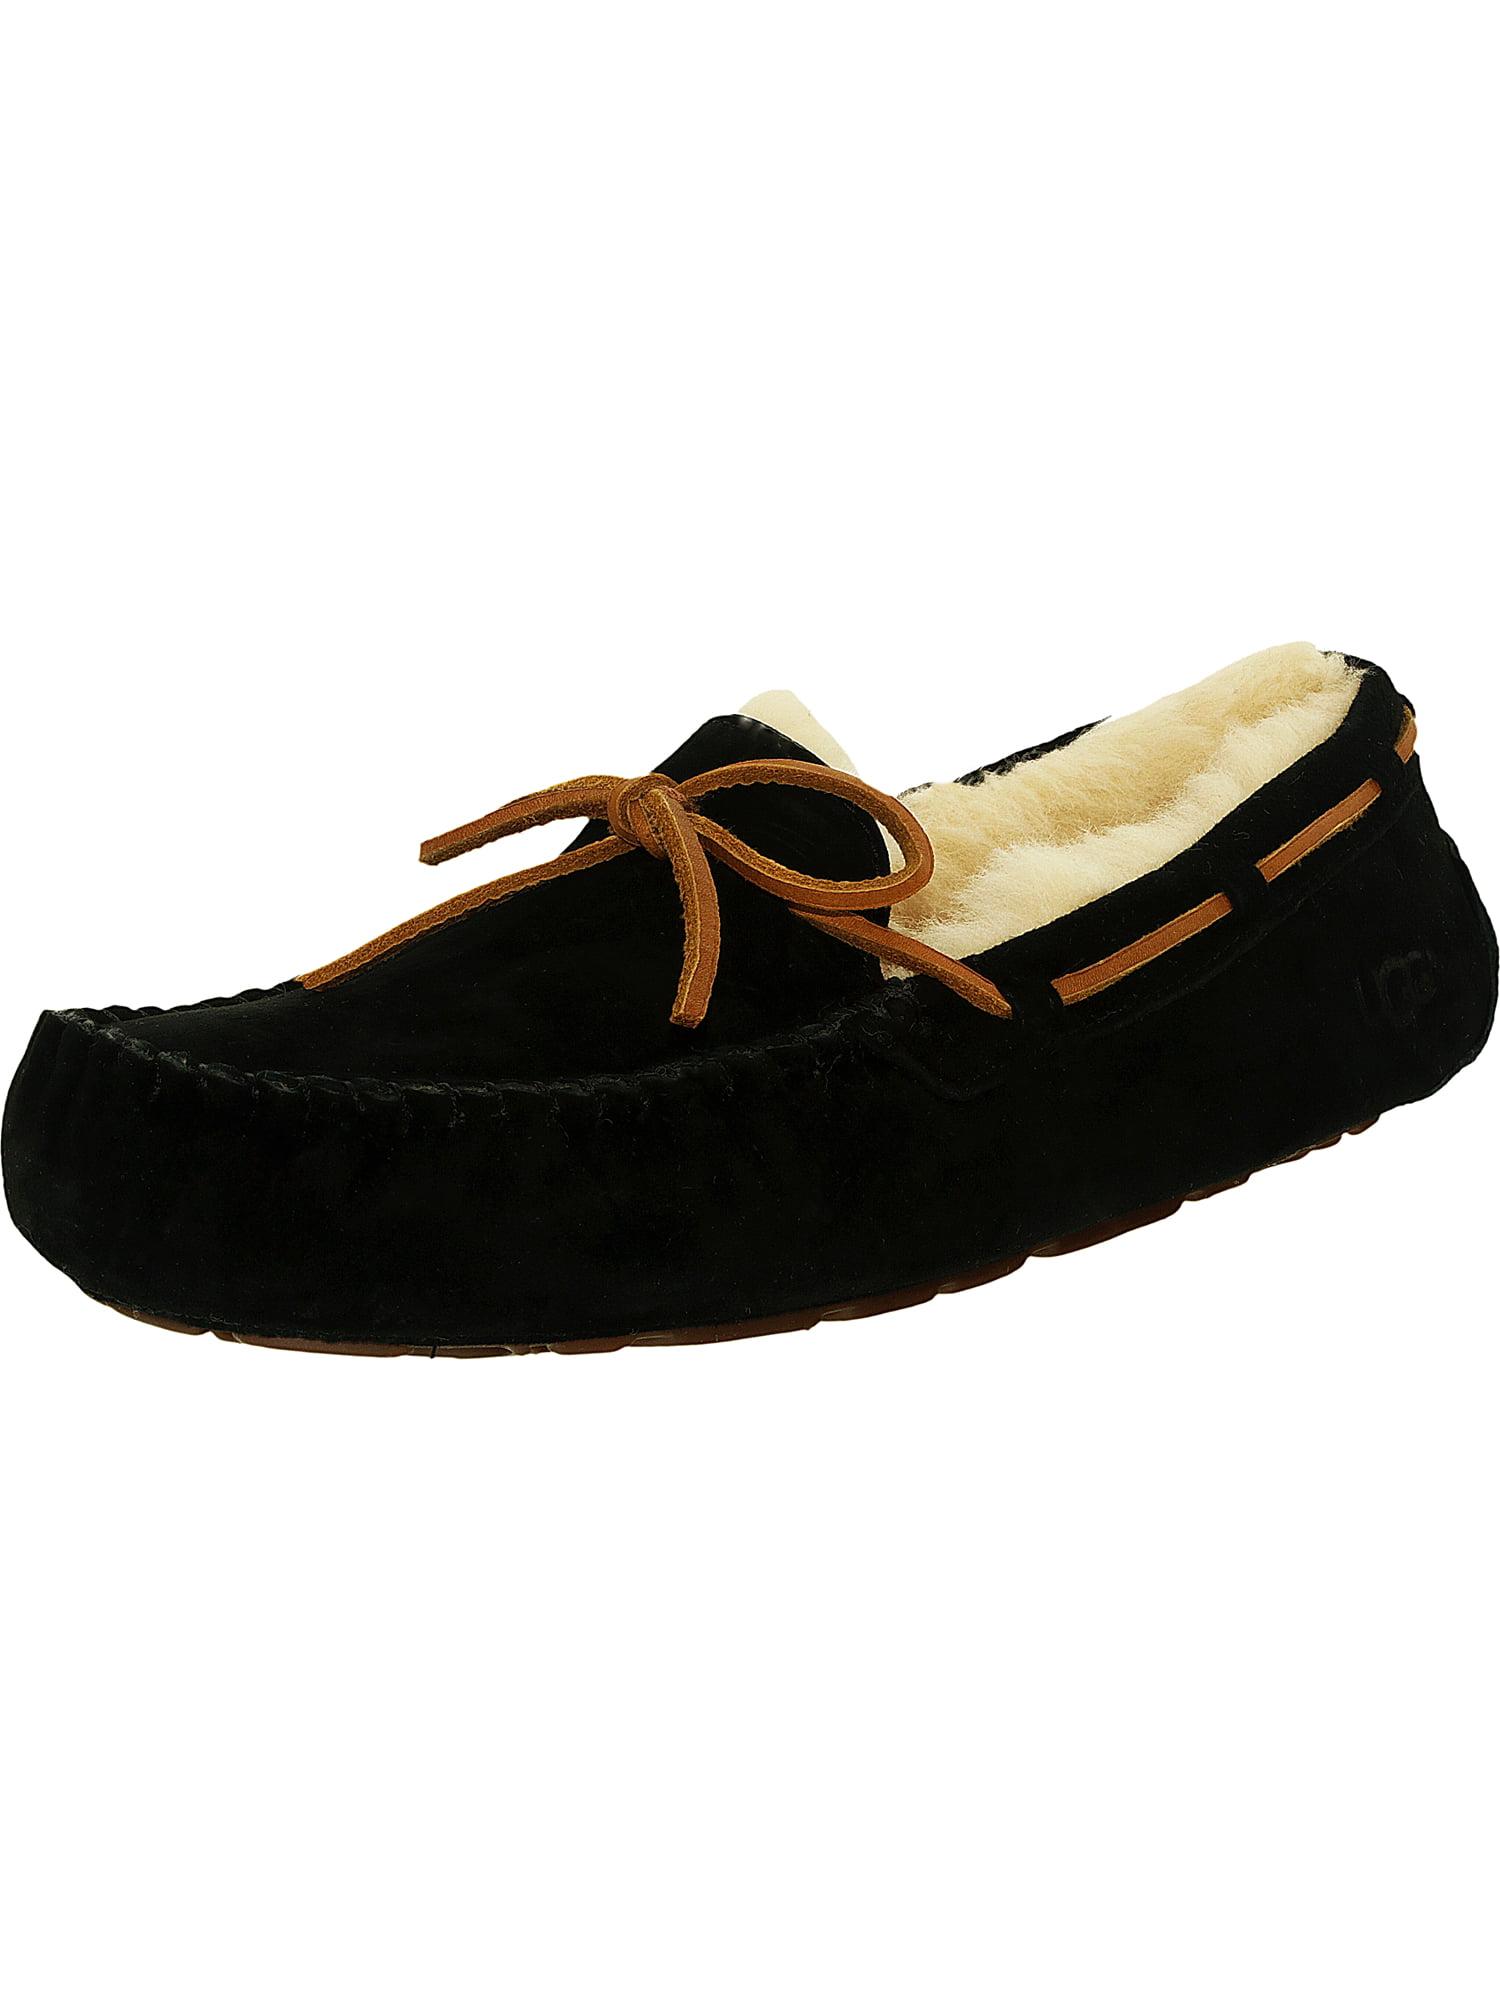 Ugg Women's Dakota Leather Black Ankle-High Suede Slipper - 5M